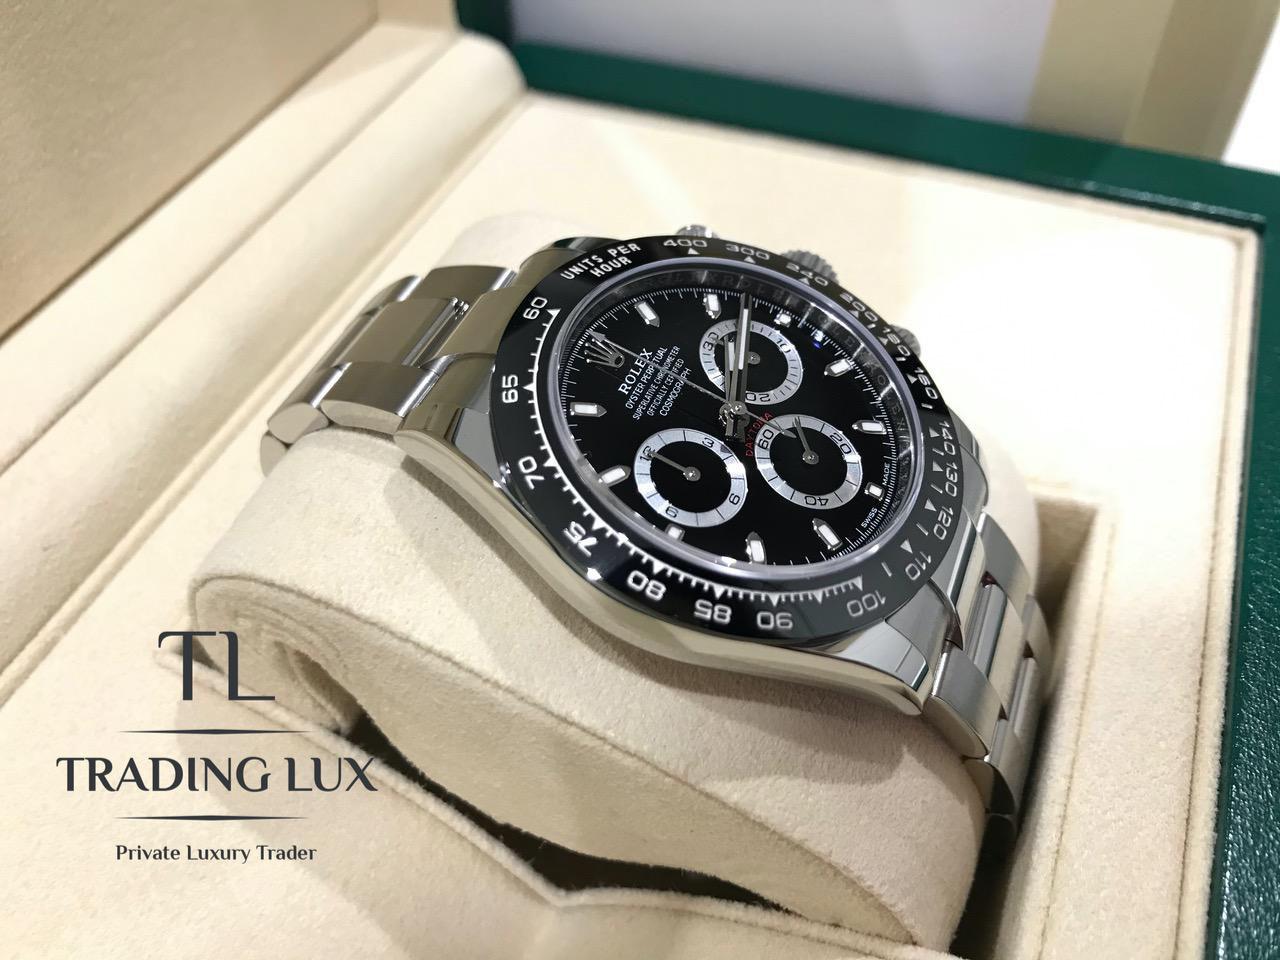 Rolex-Daytona-116500LN-Black-6